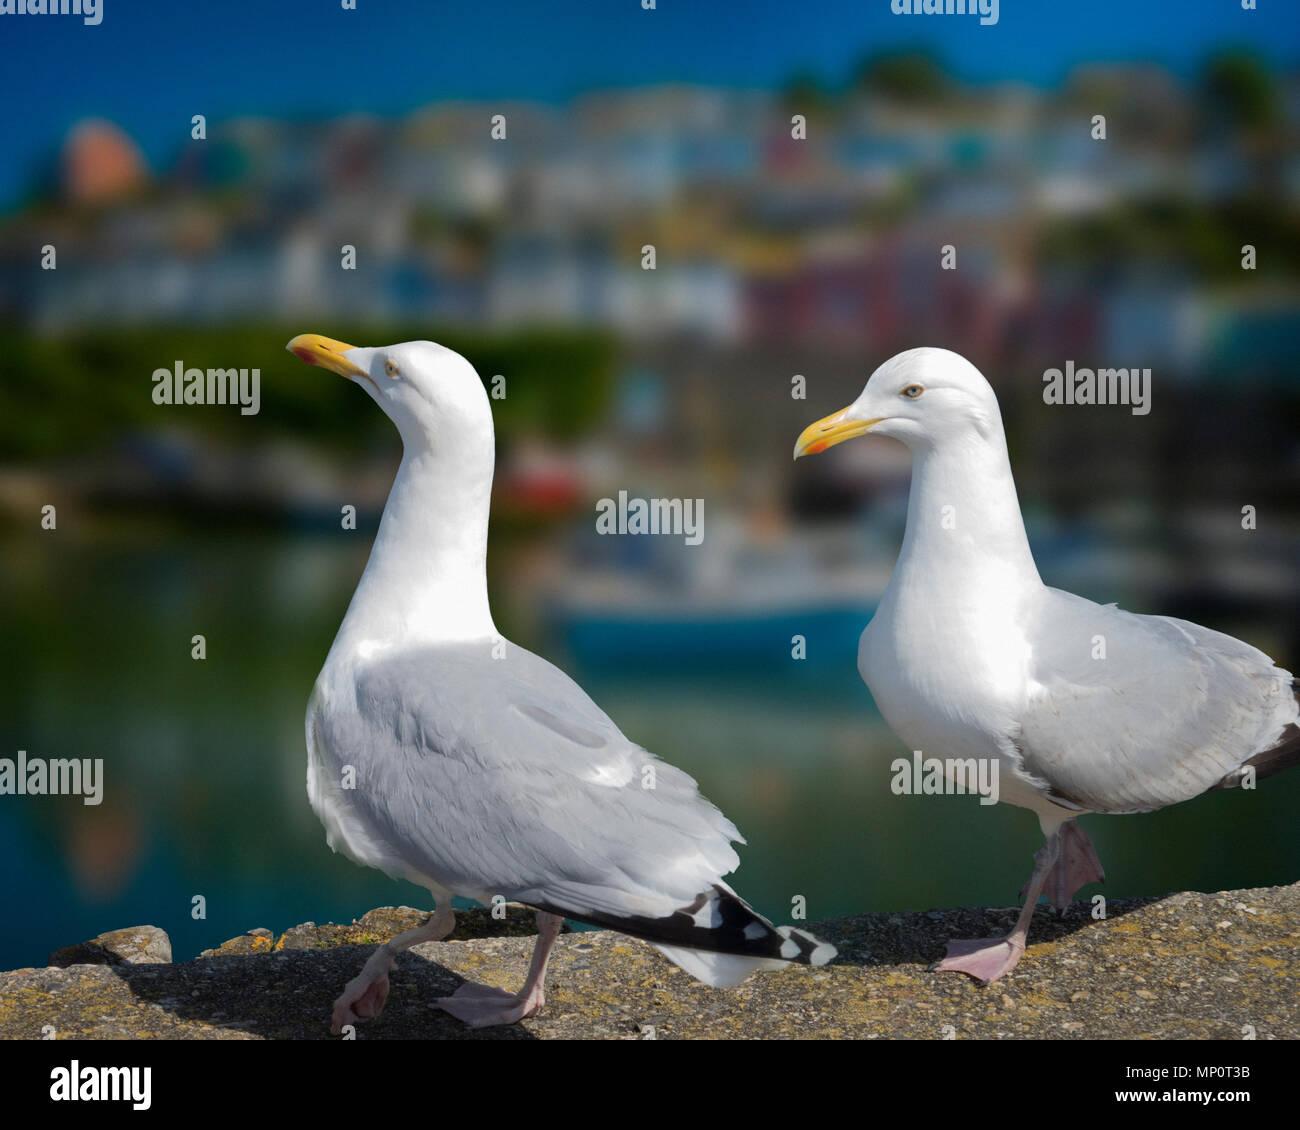 WILDLIFE: European Herring Gulls at Brixham Harbour, Devon, Great Britain - Stock Image